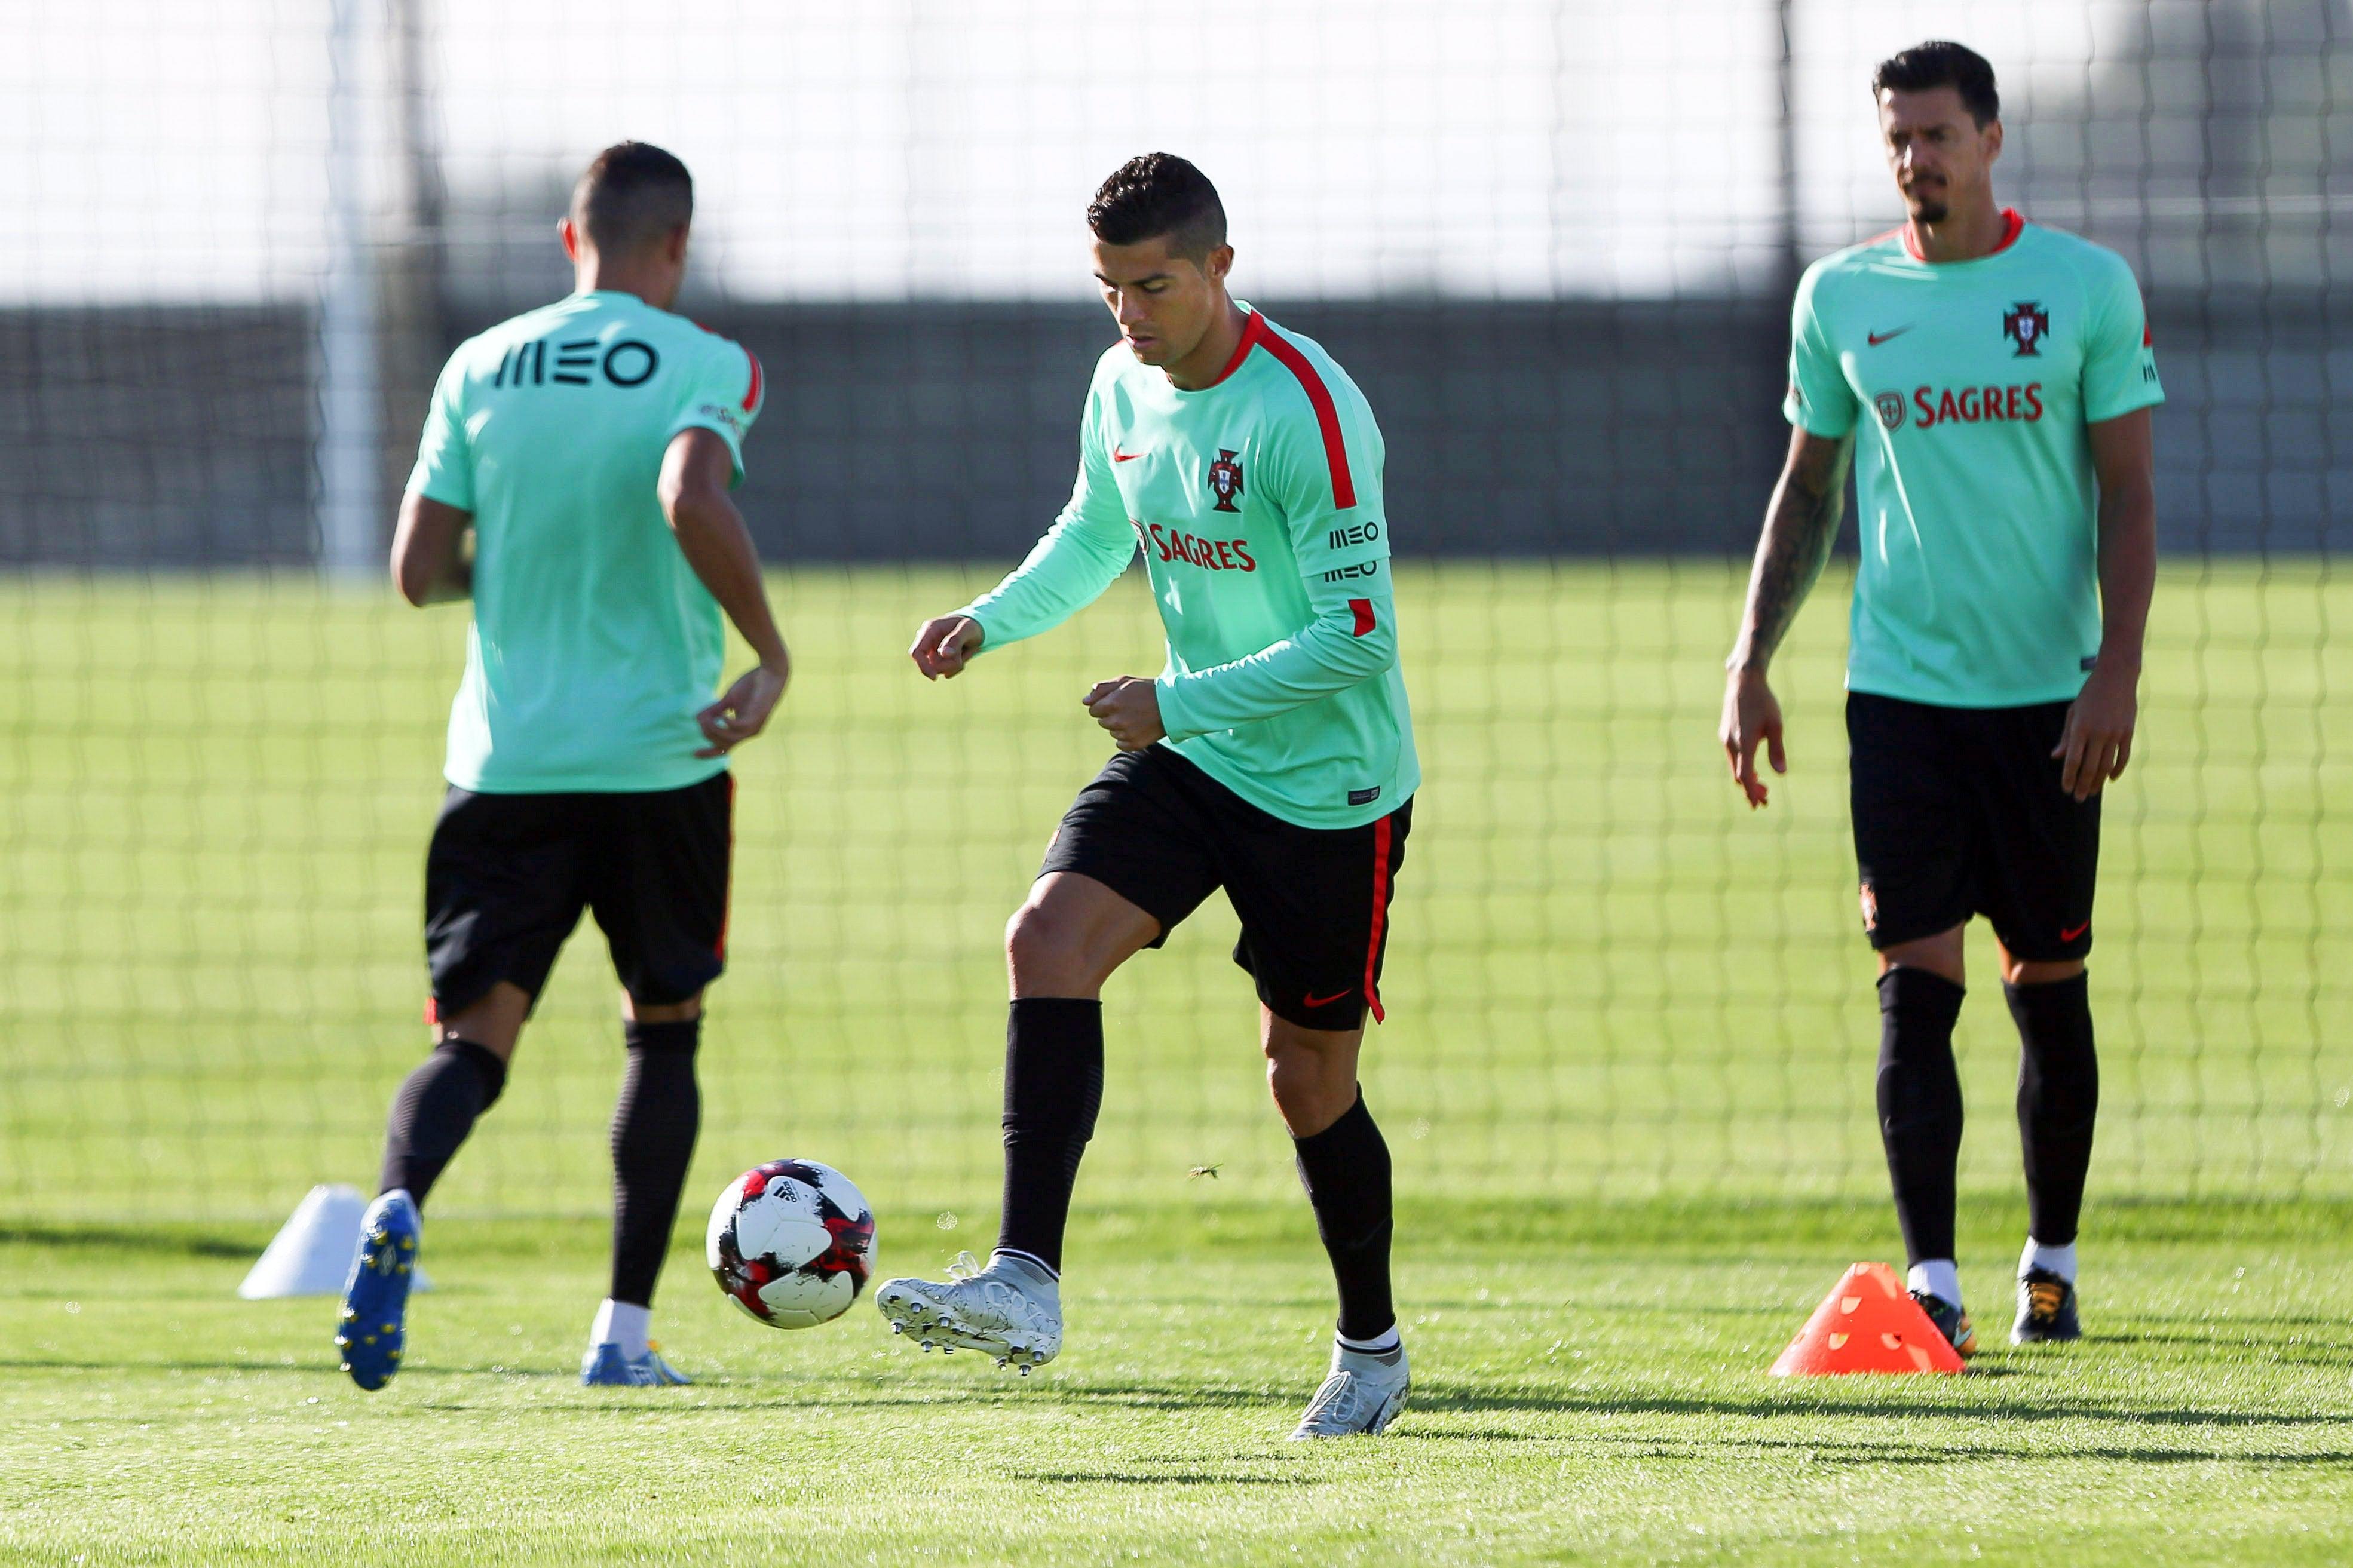 Portugal vence Suíça e carimba passaporte para o Mundial'2018